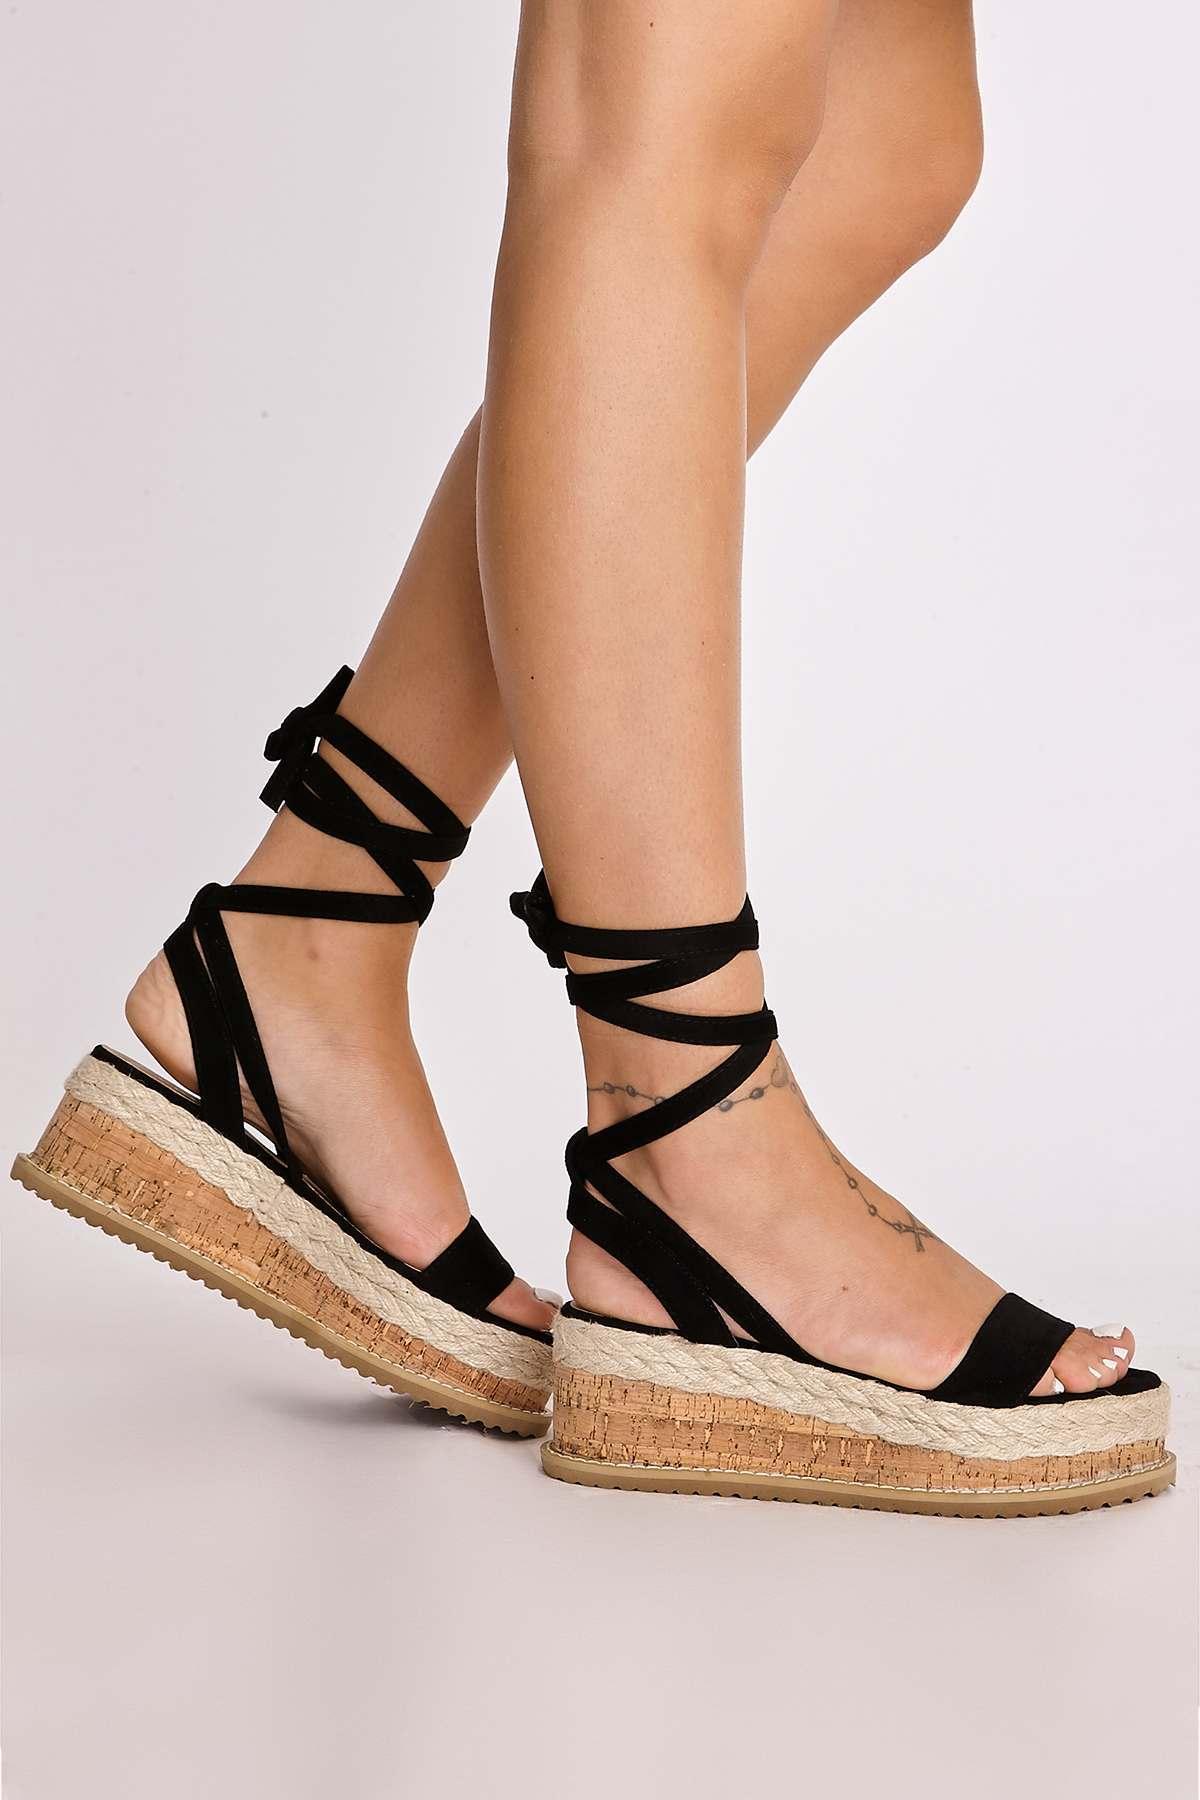 0c9322cad SELBY BLACK FAUX SUEDE TIE LEG PLATFORM ESPADRILLES | In The Style